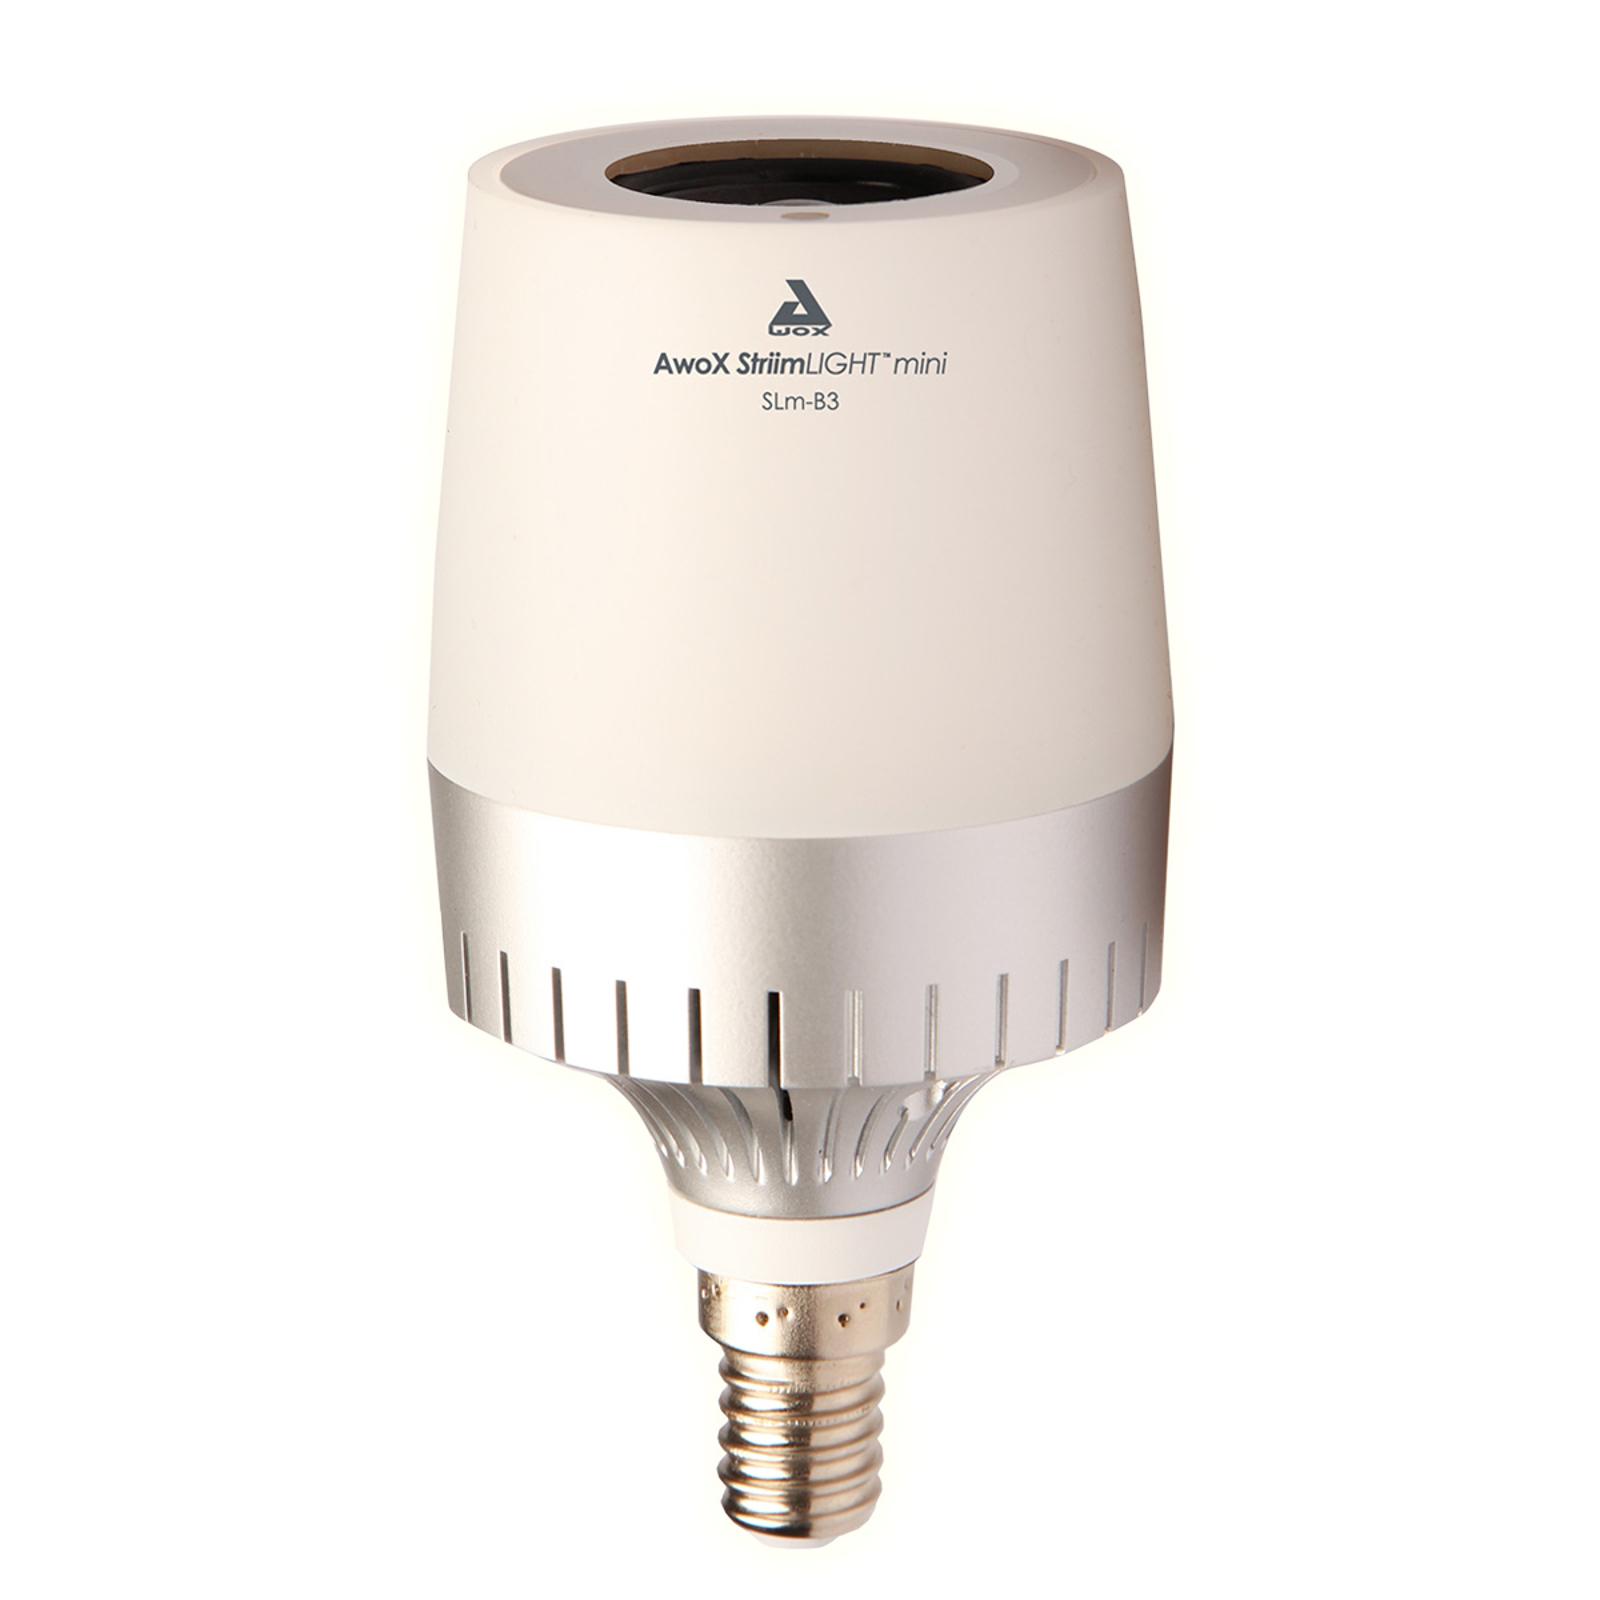 AwoX StriimLIGHT Mini White LED lampadina E14